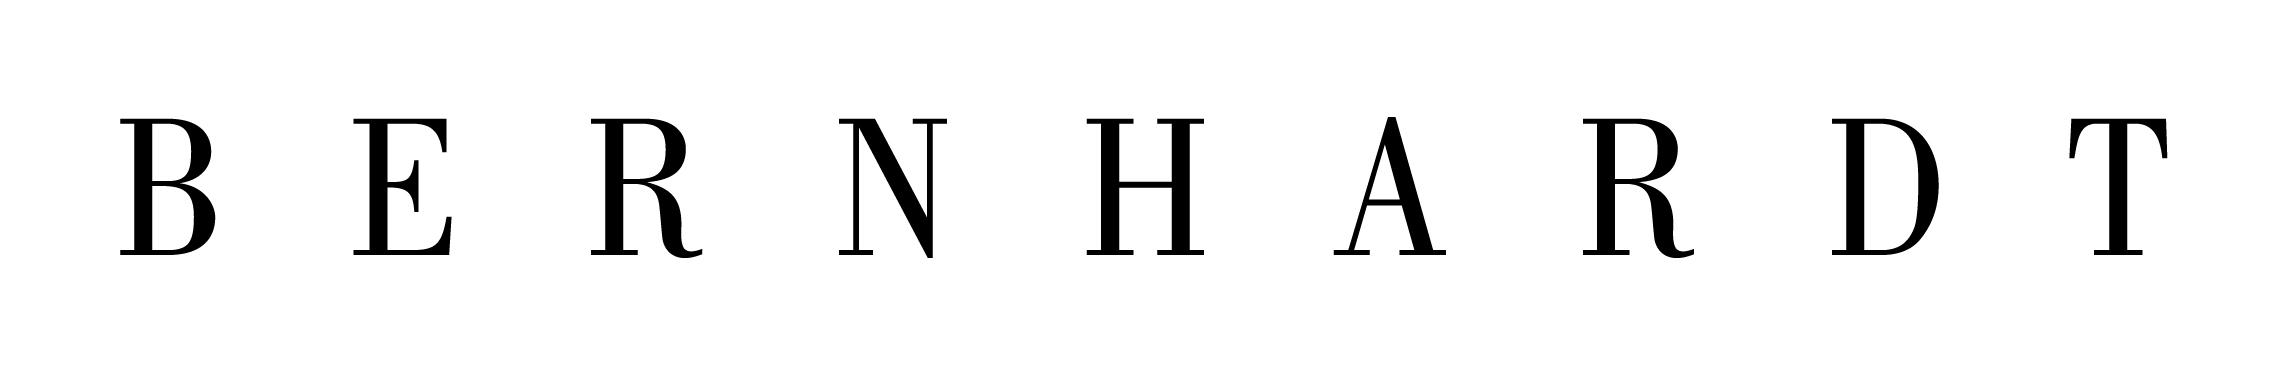 Bernhardt Vanderbyl logo Black.jpg